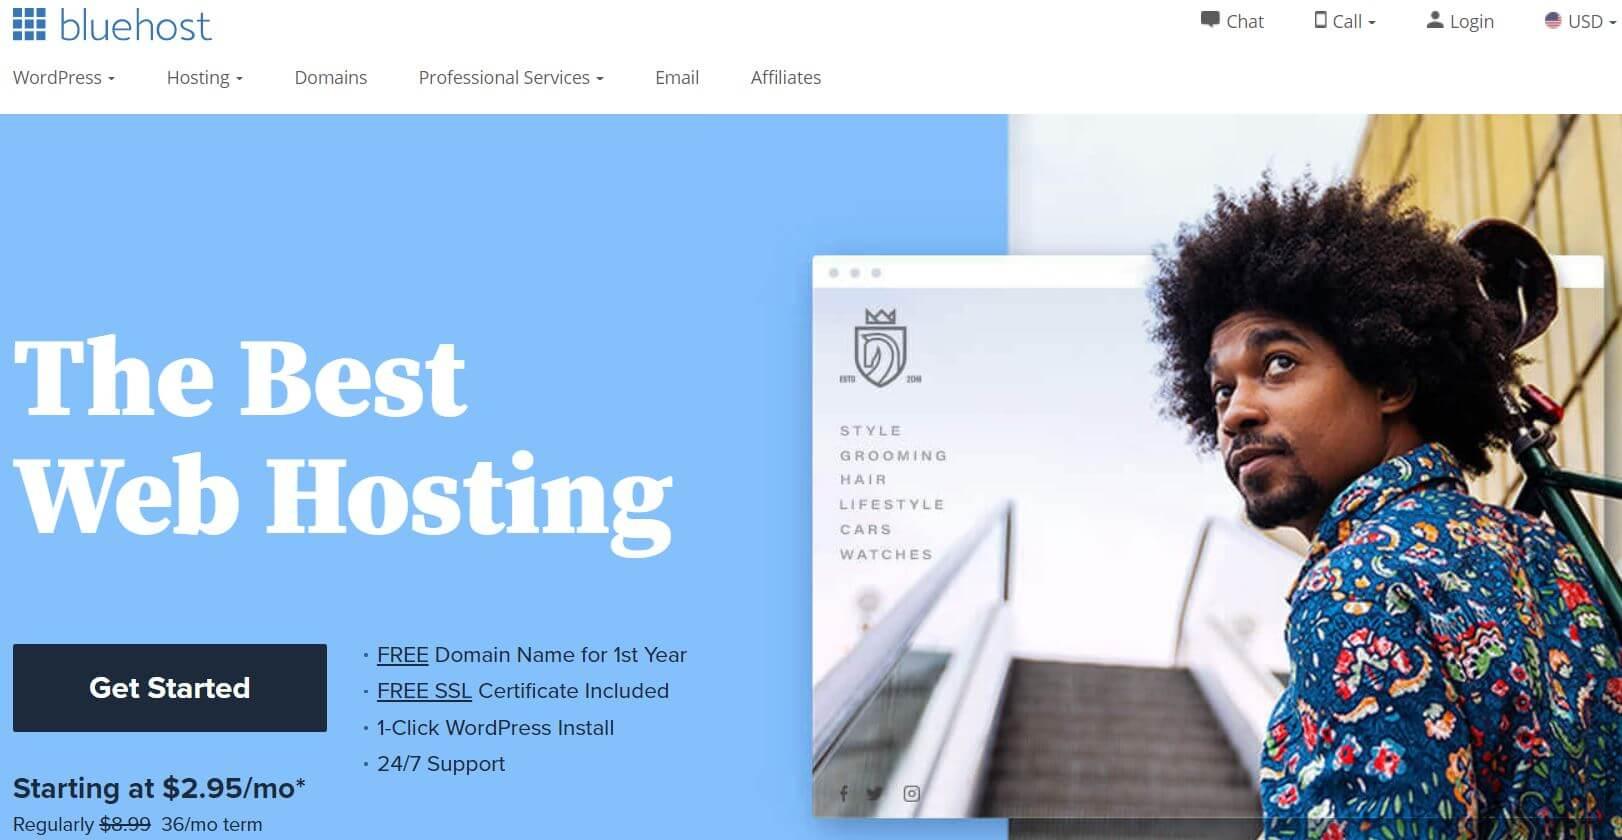 nha-cung-cap-hosting-blue-host